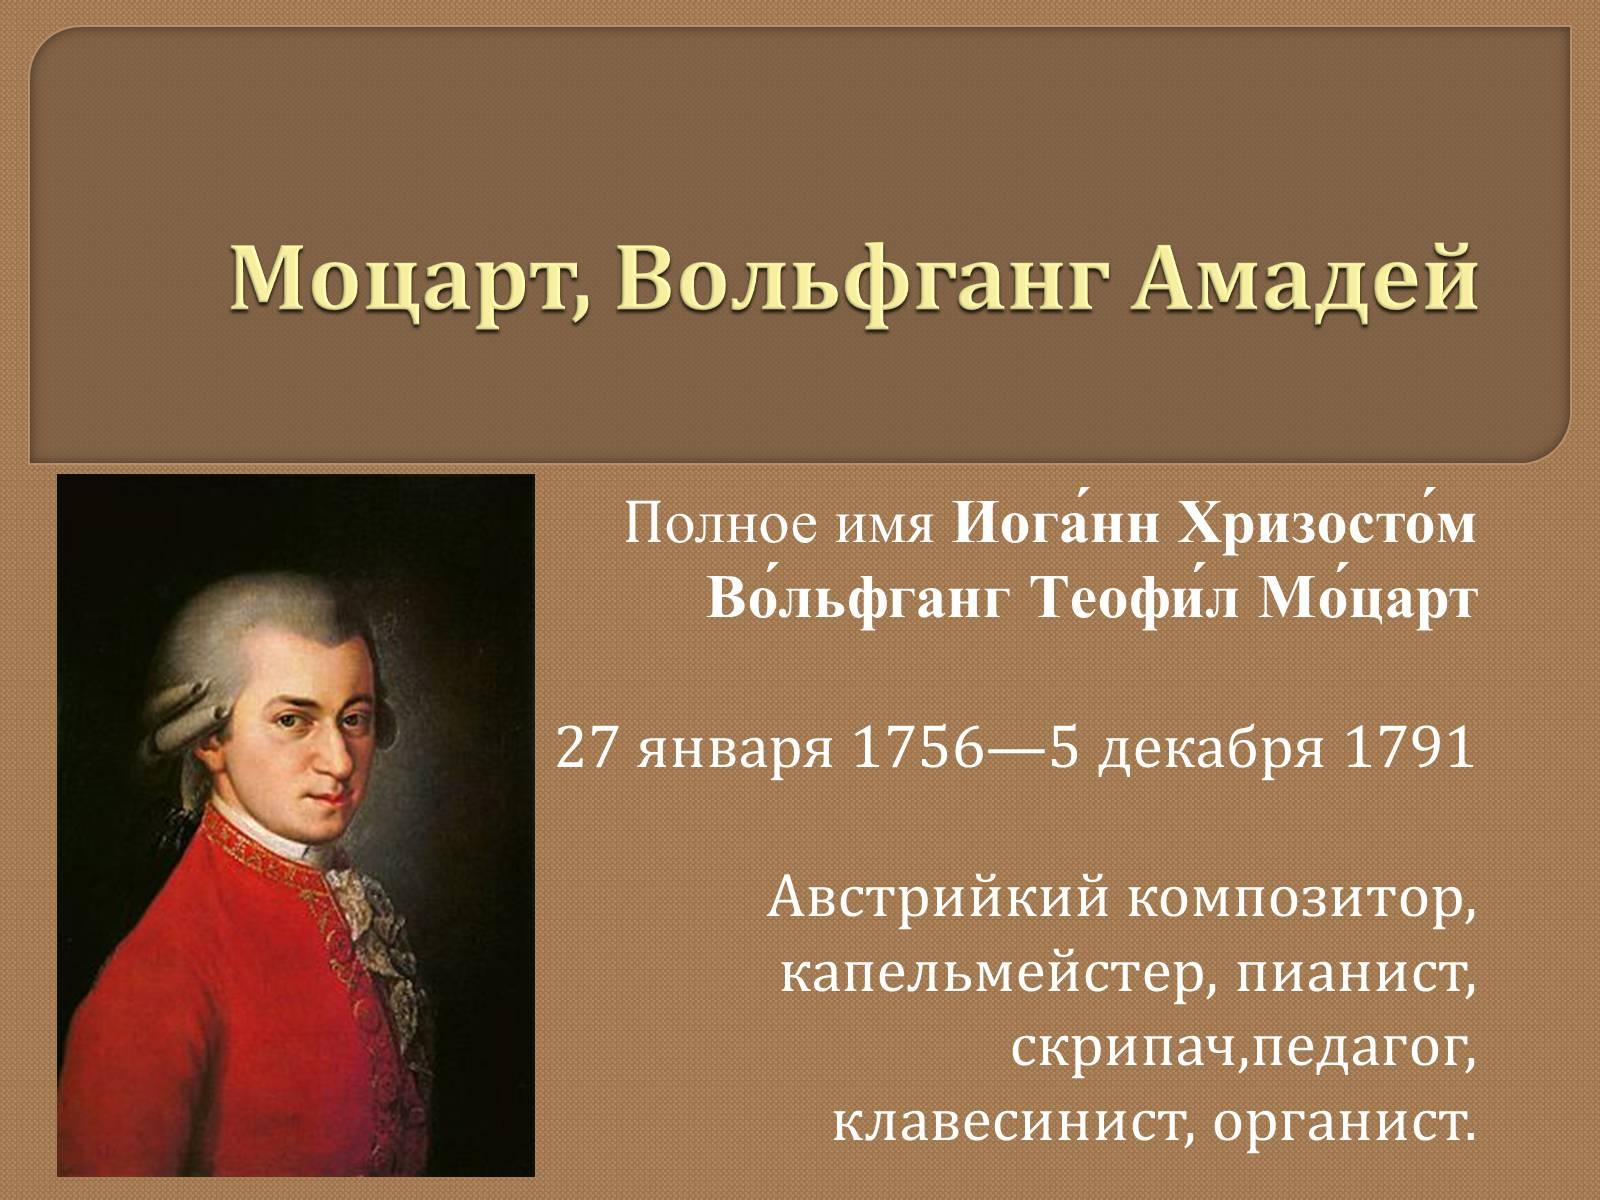 биография моцарта с картинками тушка